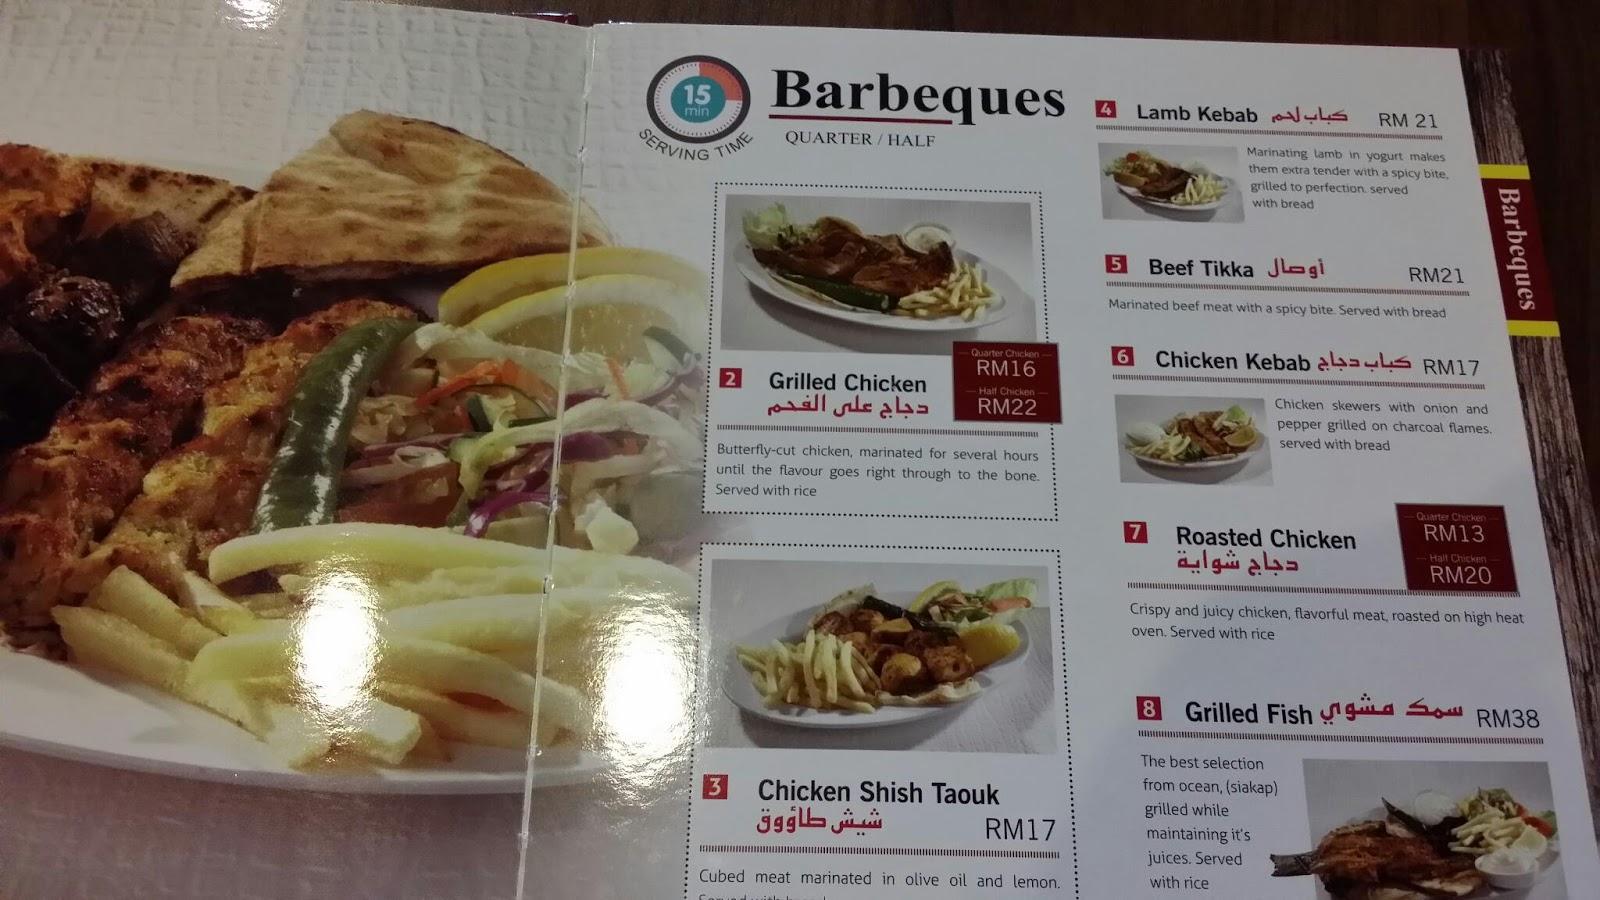 Eye Talk Nose (I Don't Know) Food Menu Malaysia: Saba Restaurant